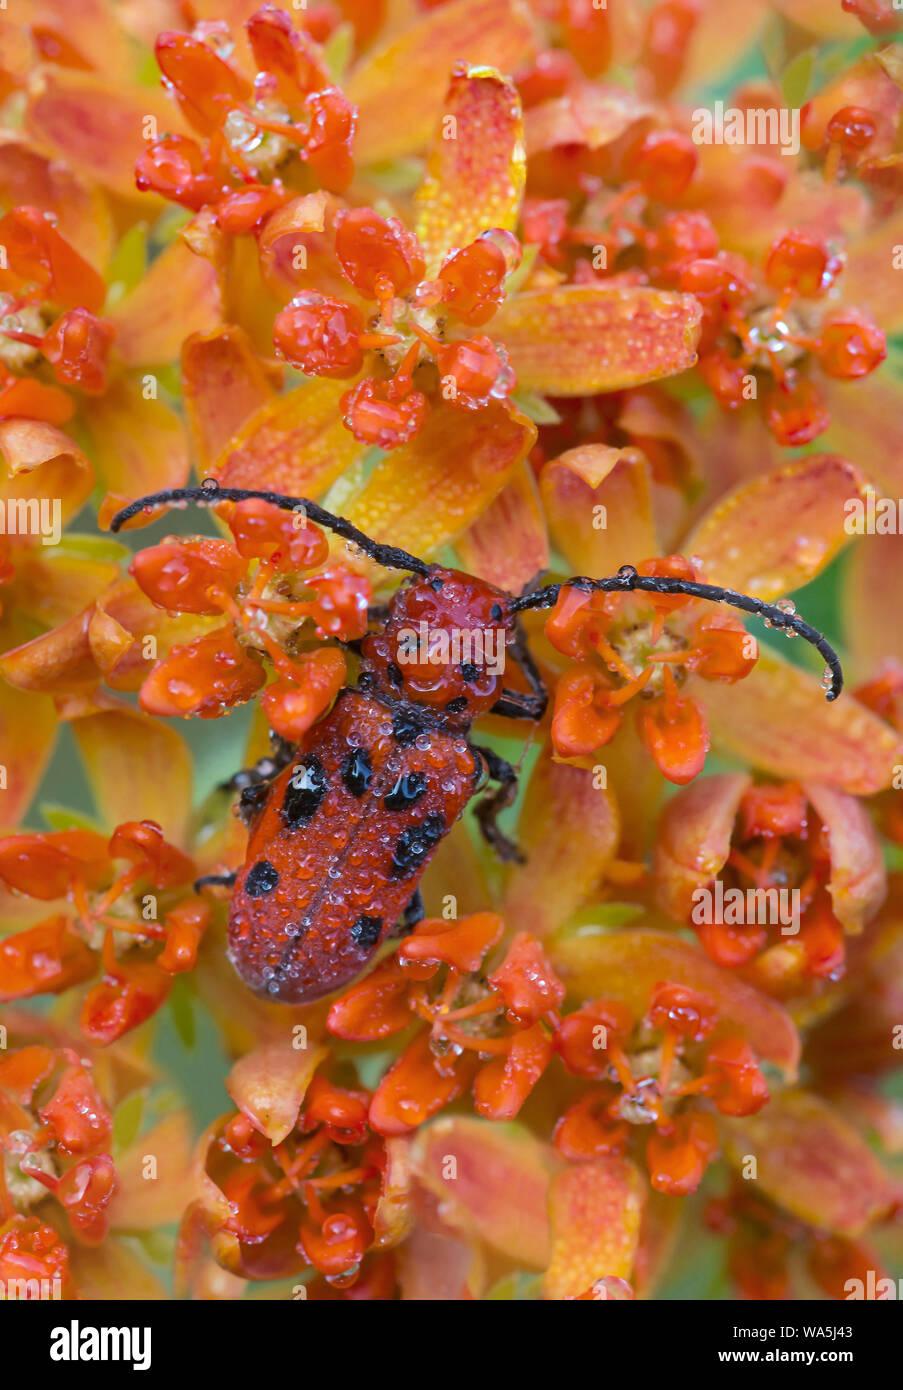 Cubierto de rocío Asclepias escarabajo rojo (Tetraopes tetrophthalmus) en flores de Butterfly Weed (Asclepias tuberosa), en la región oriental de Estados Unidos Foto de stock